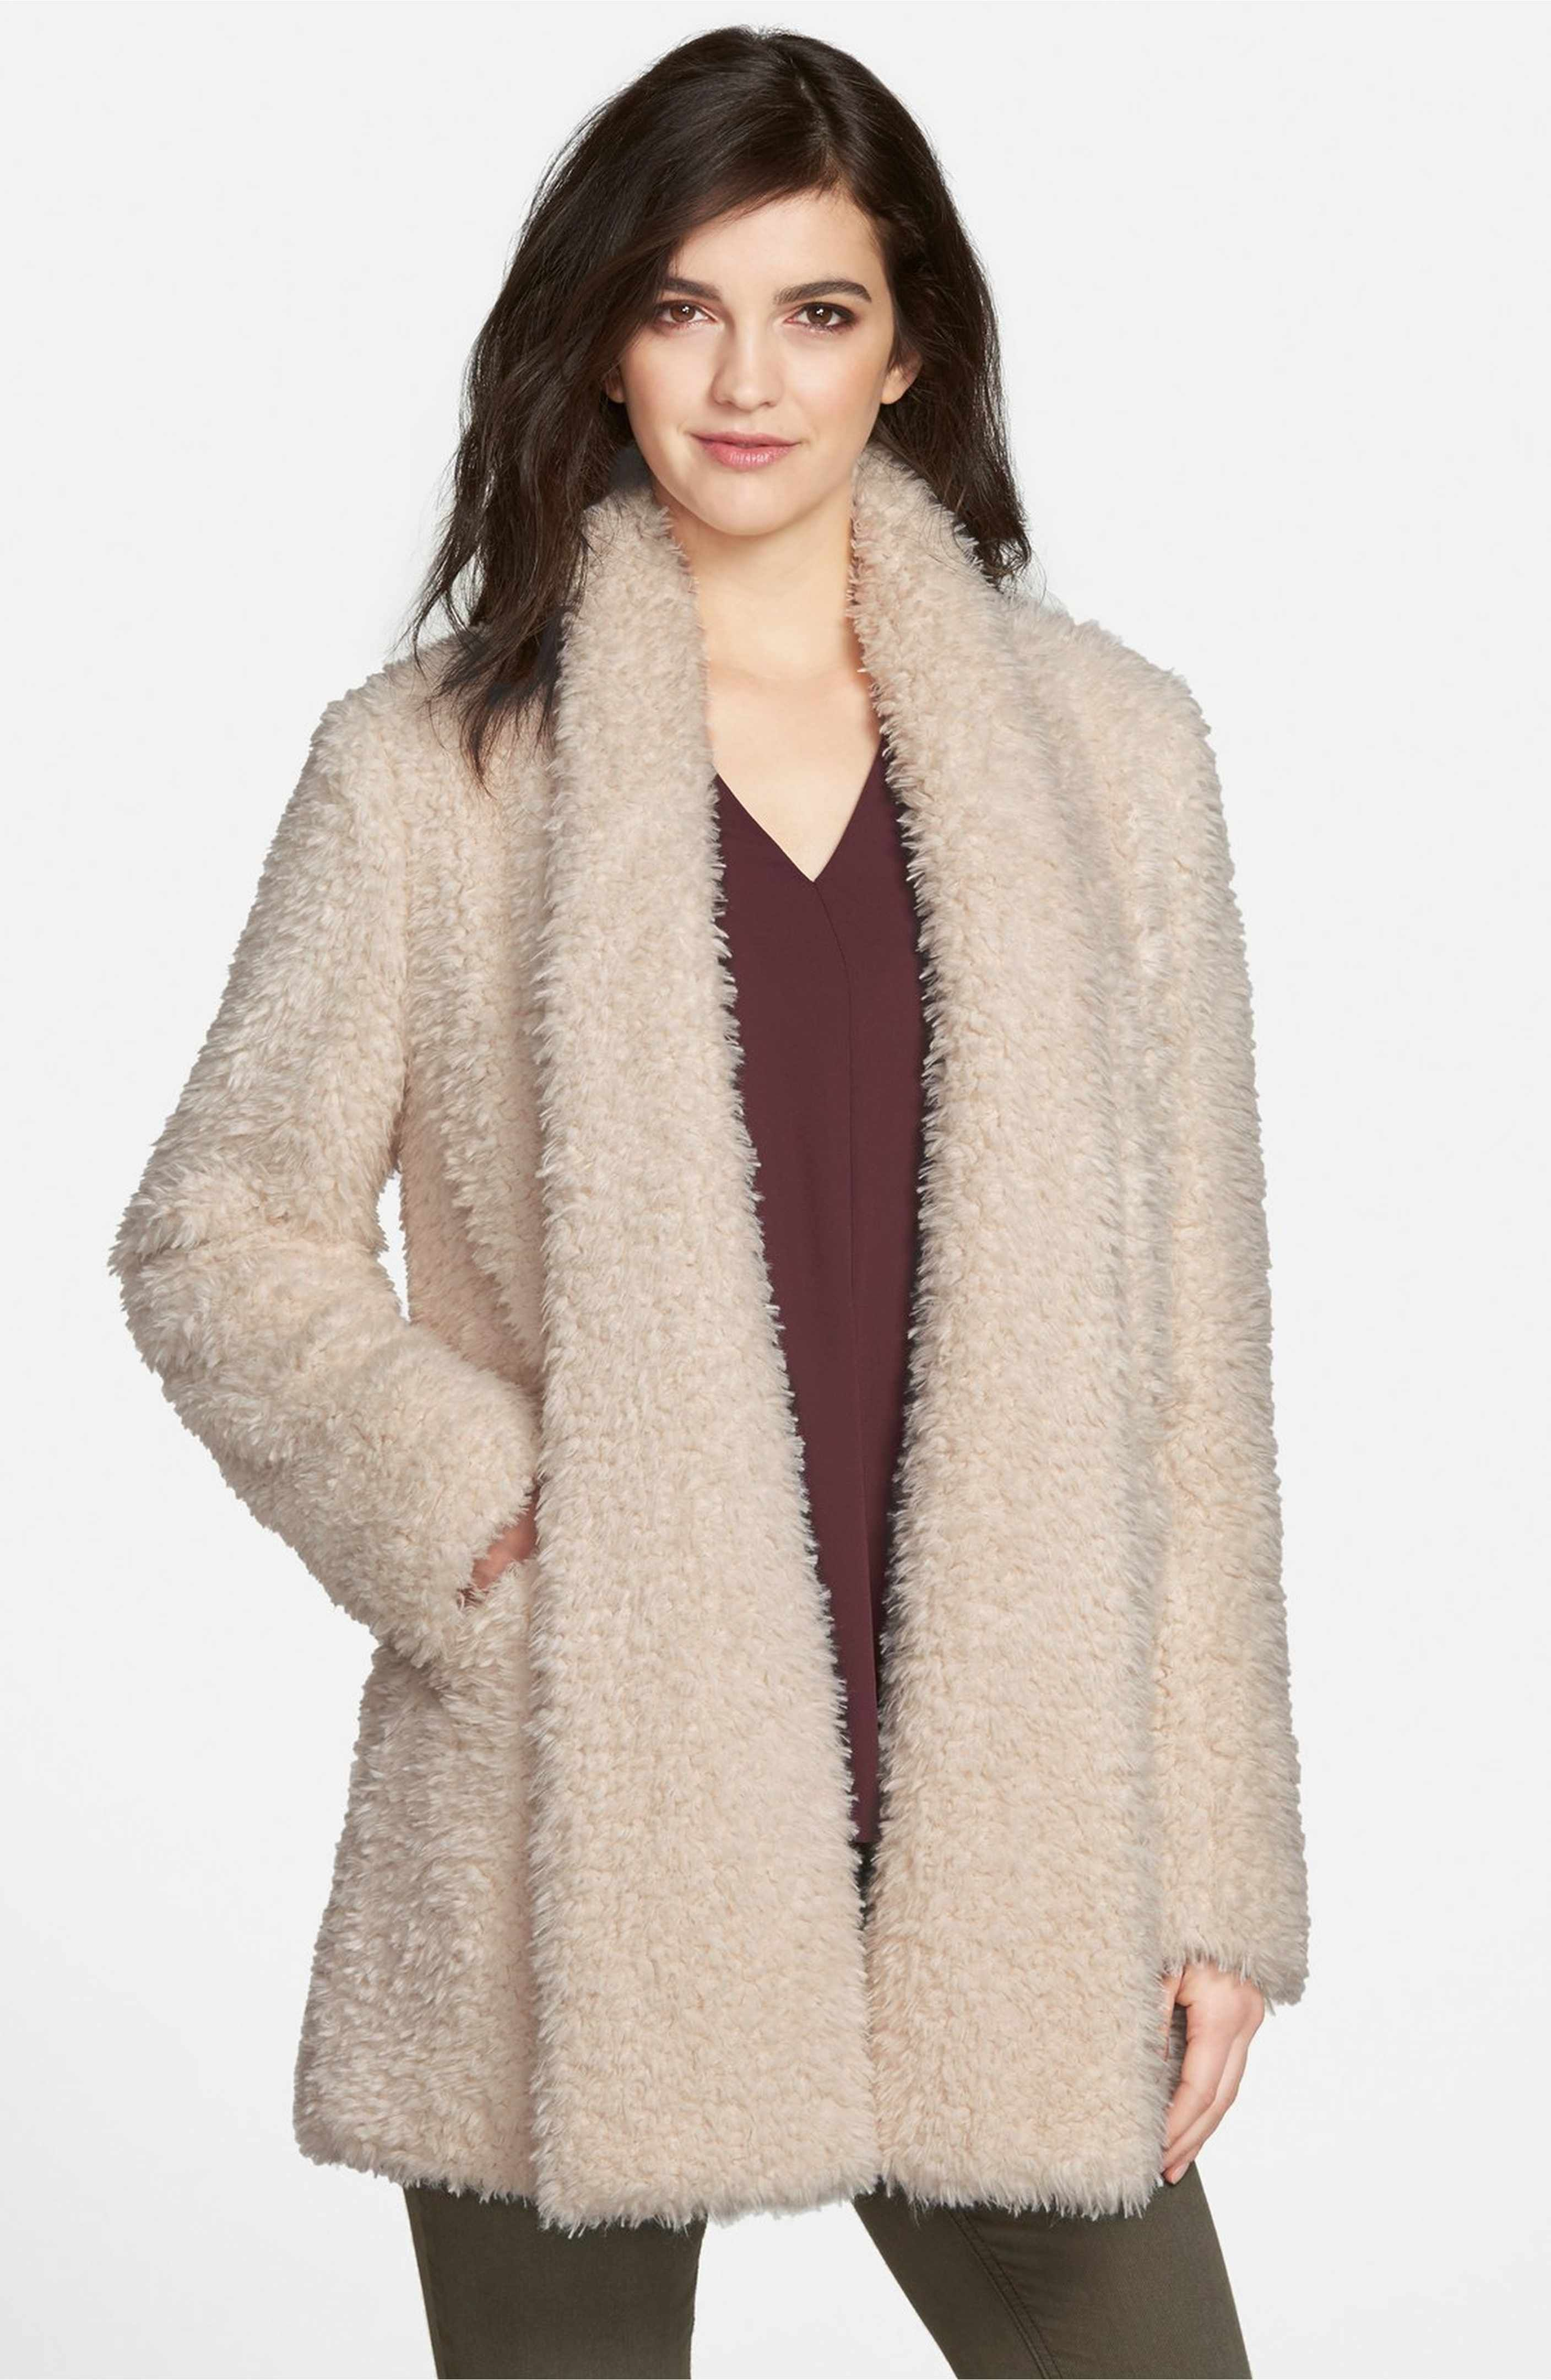 9e1e51e056720 Main Image - Kenneth Cole New York  Teddy Bear  Faux Fur Clutch Coat ...